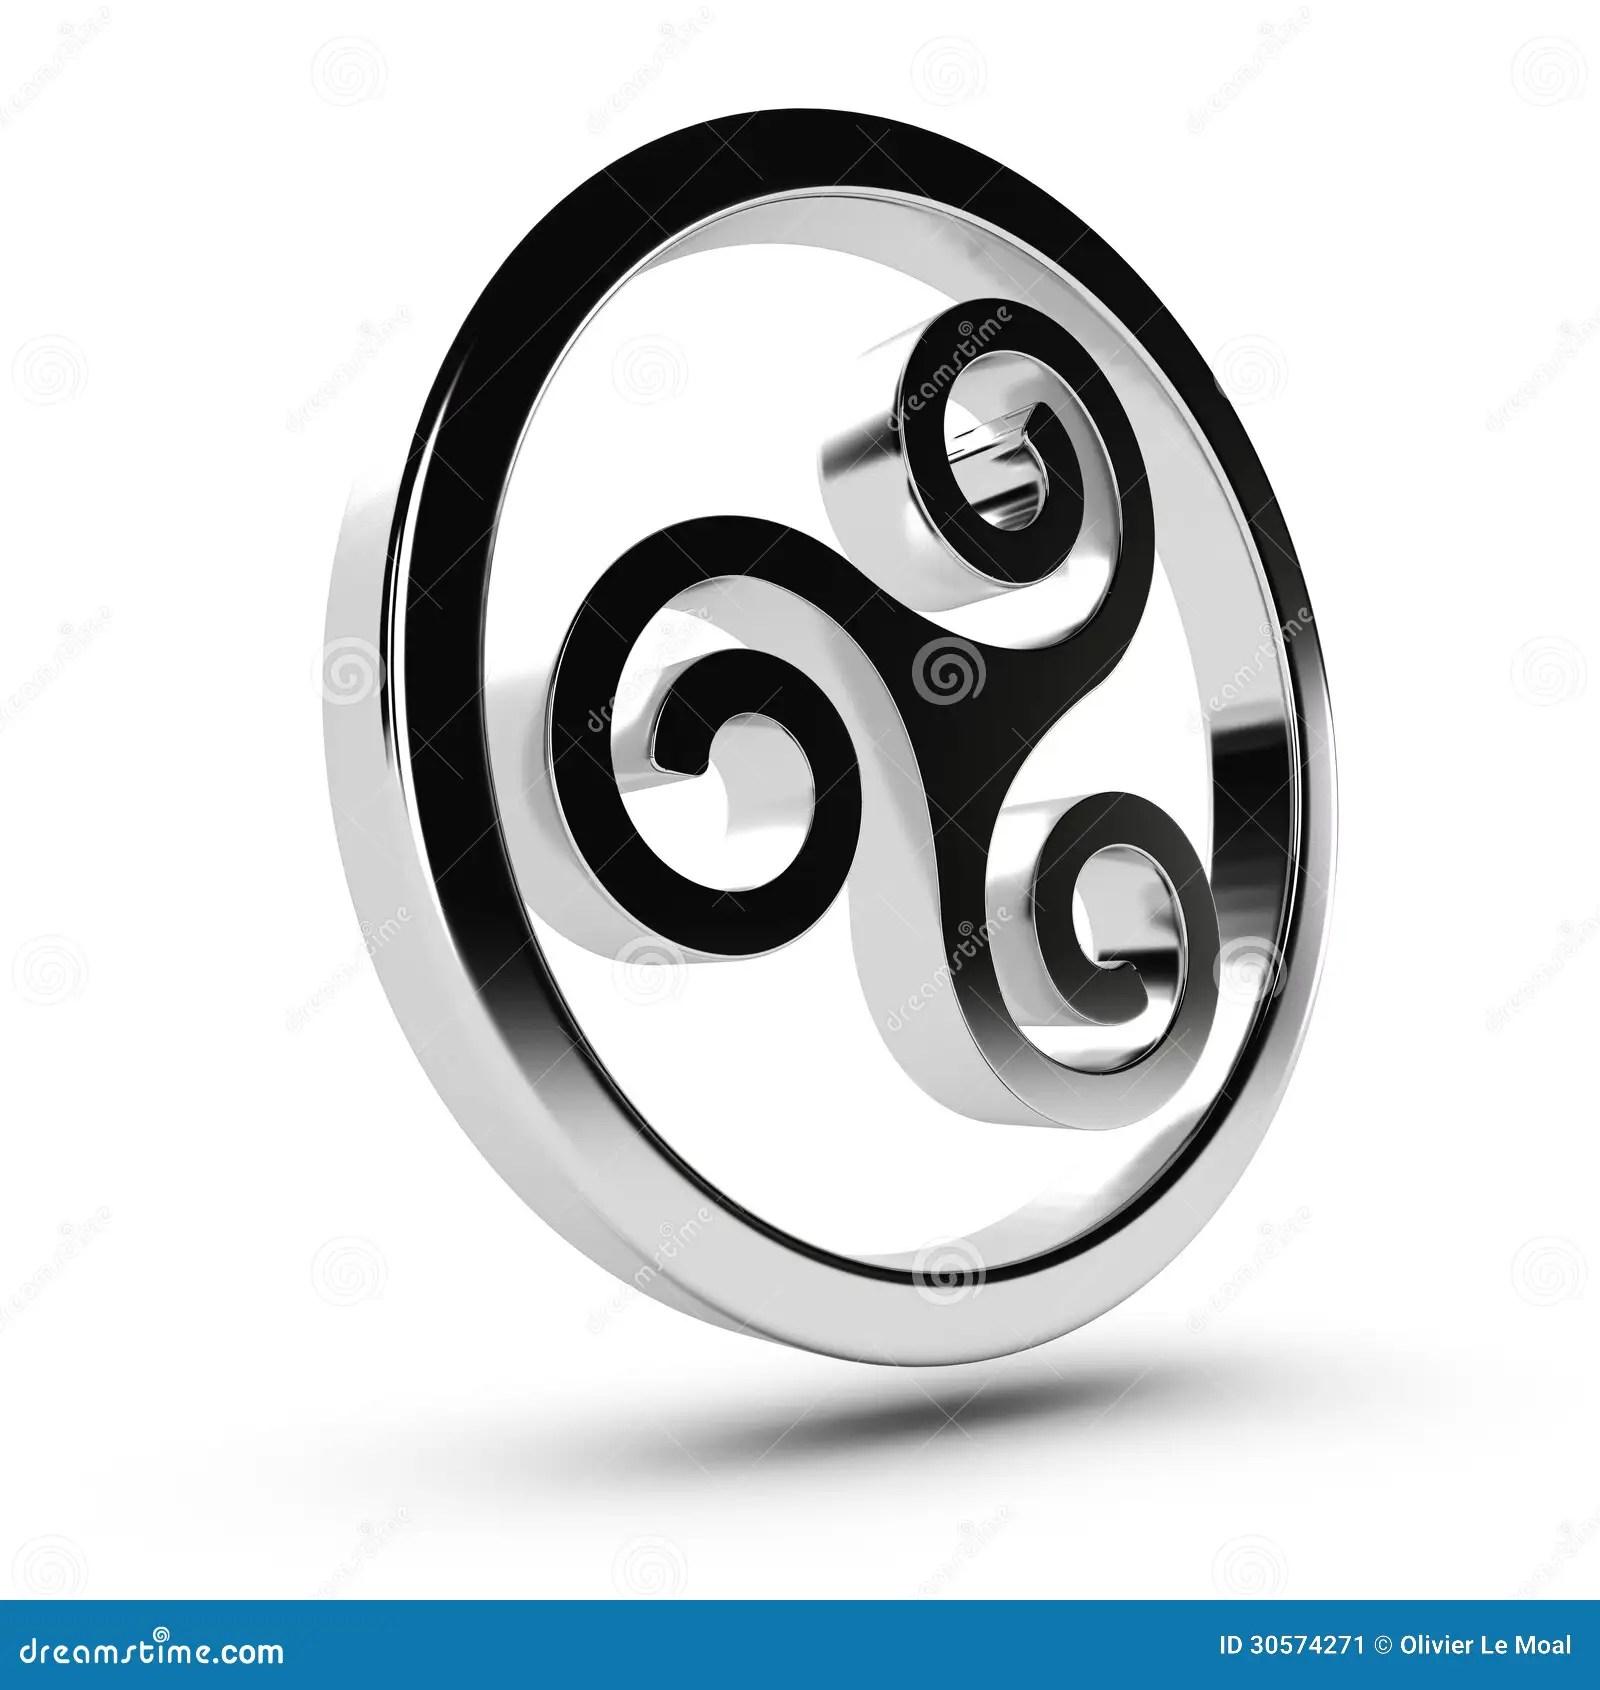 Of celtic triskele symbol meaning of celtic triskele symbol biocorpaavc